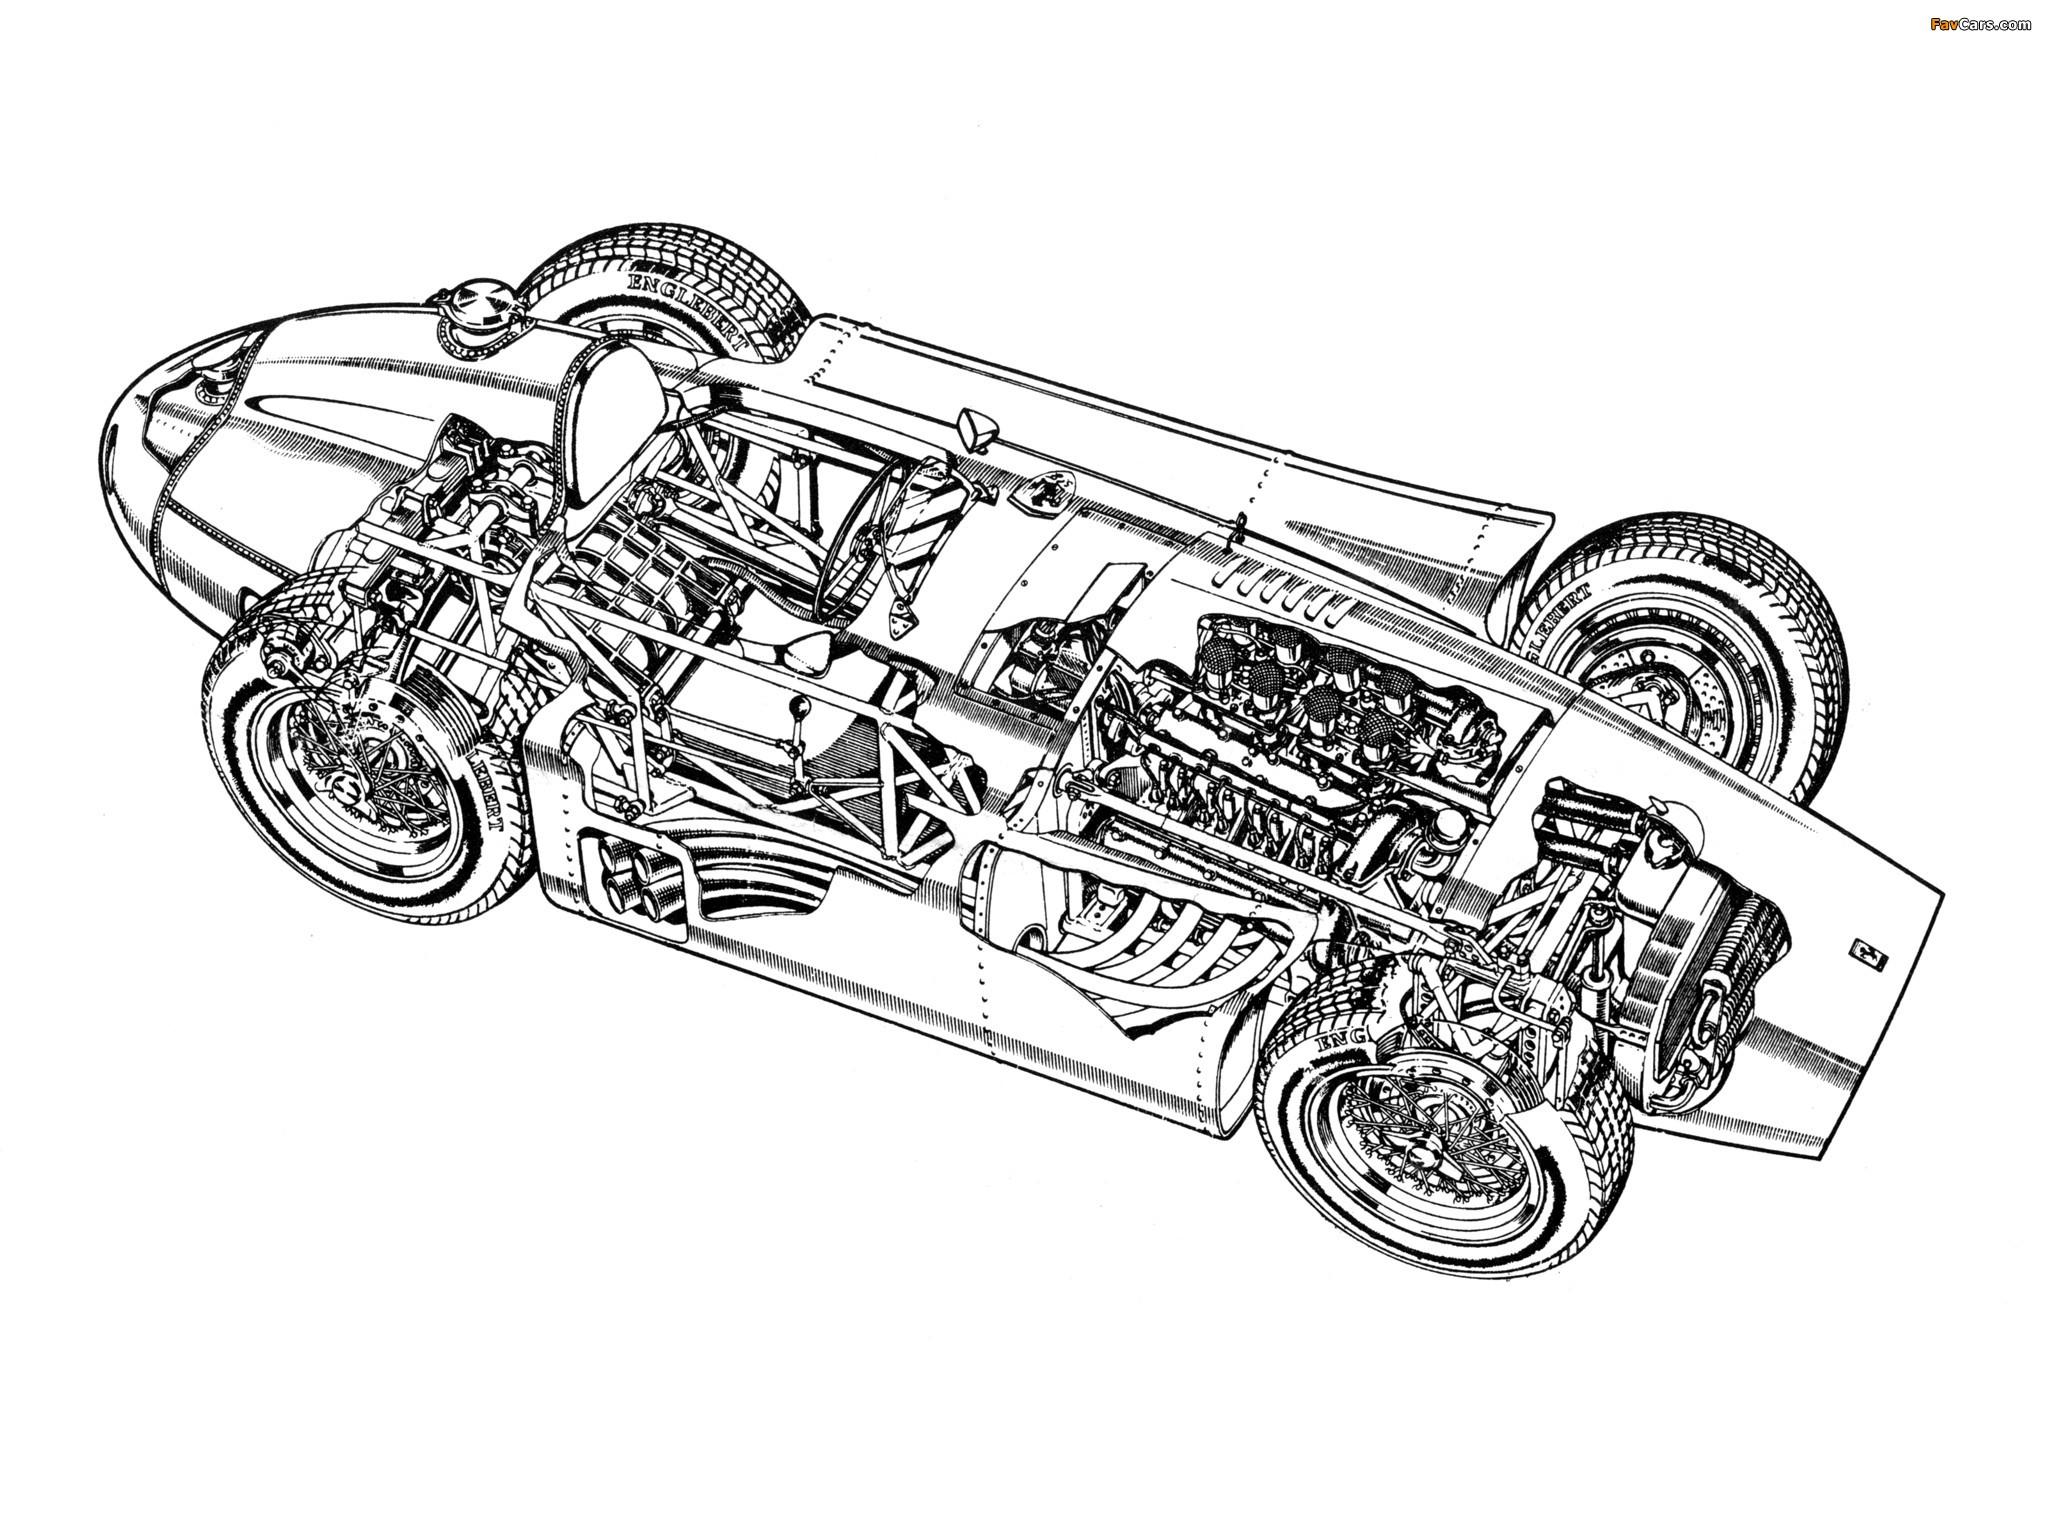 Lancia d50 formula 1 195456 images ferrari lancia d50 formula 1 195456 images vanachro Gallery